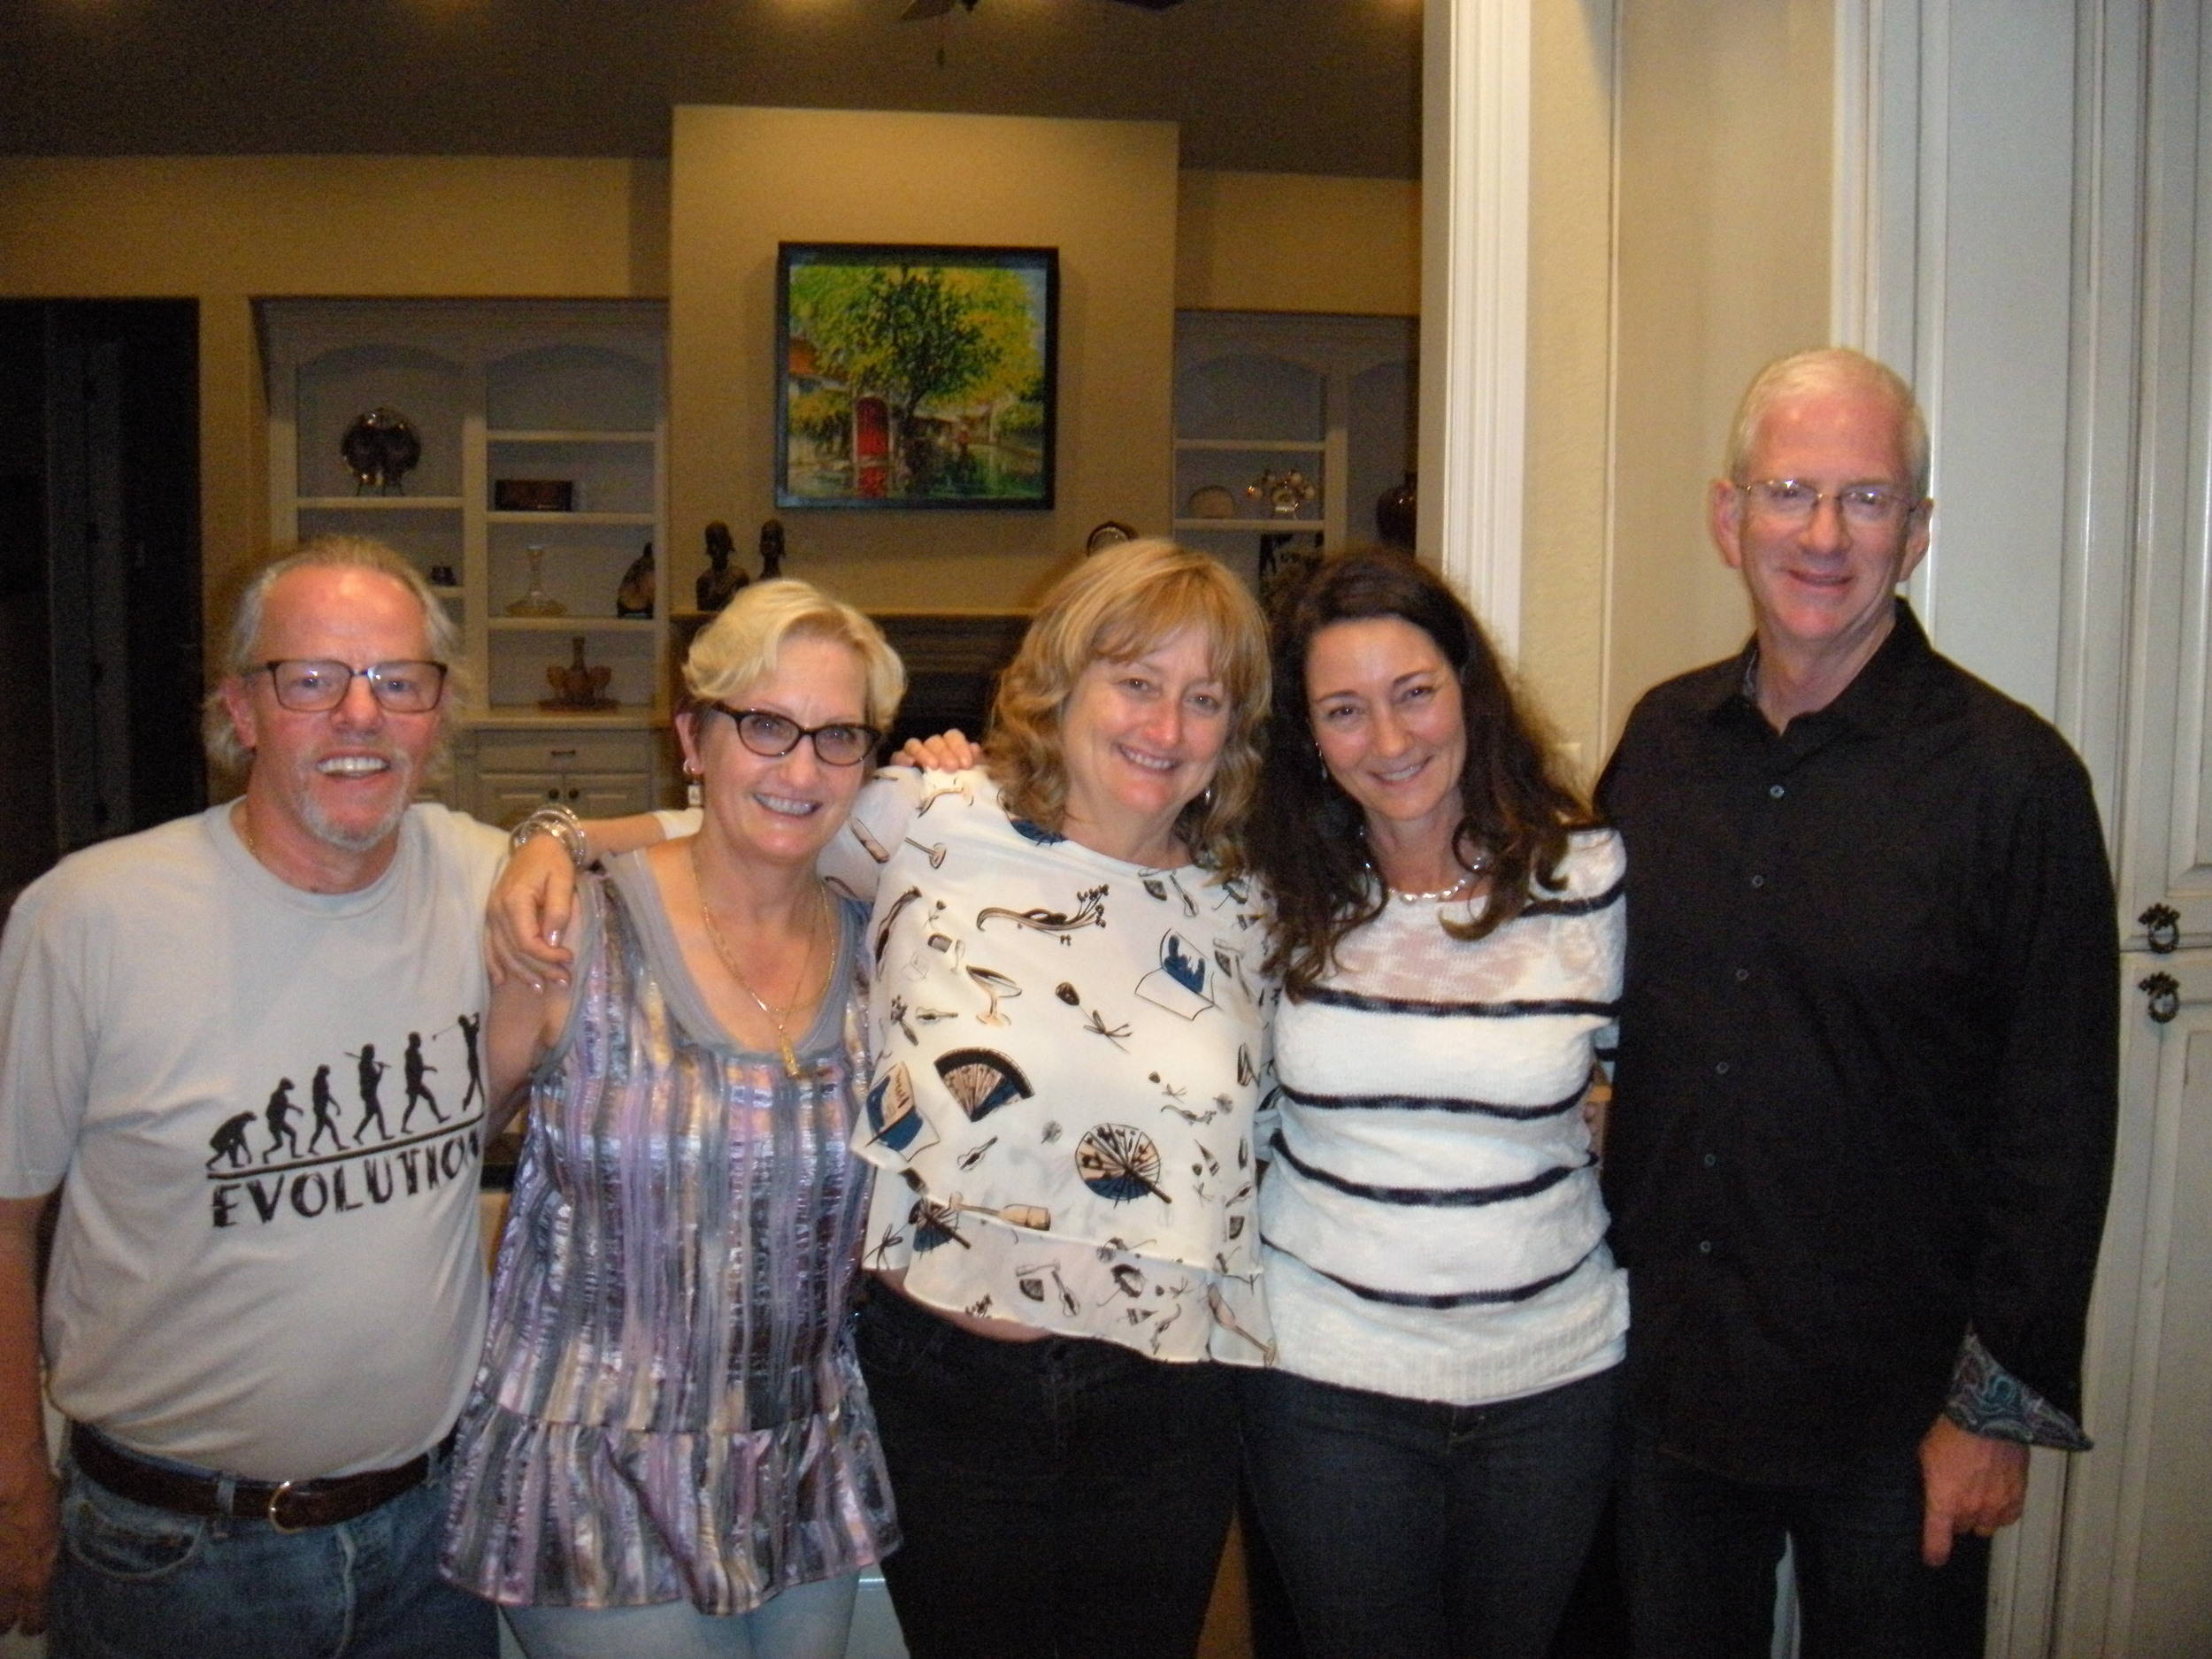 David, me, Tere, Diana, and Charlie.